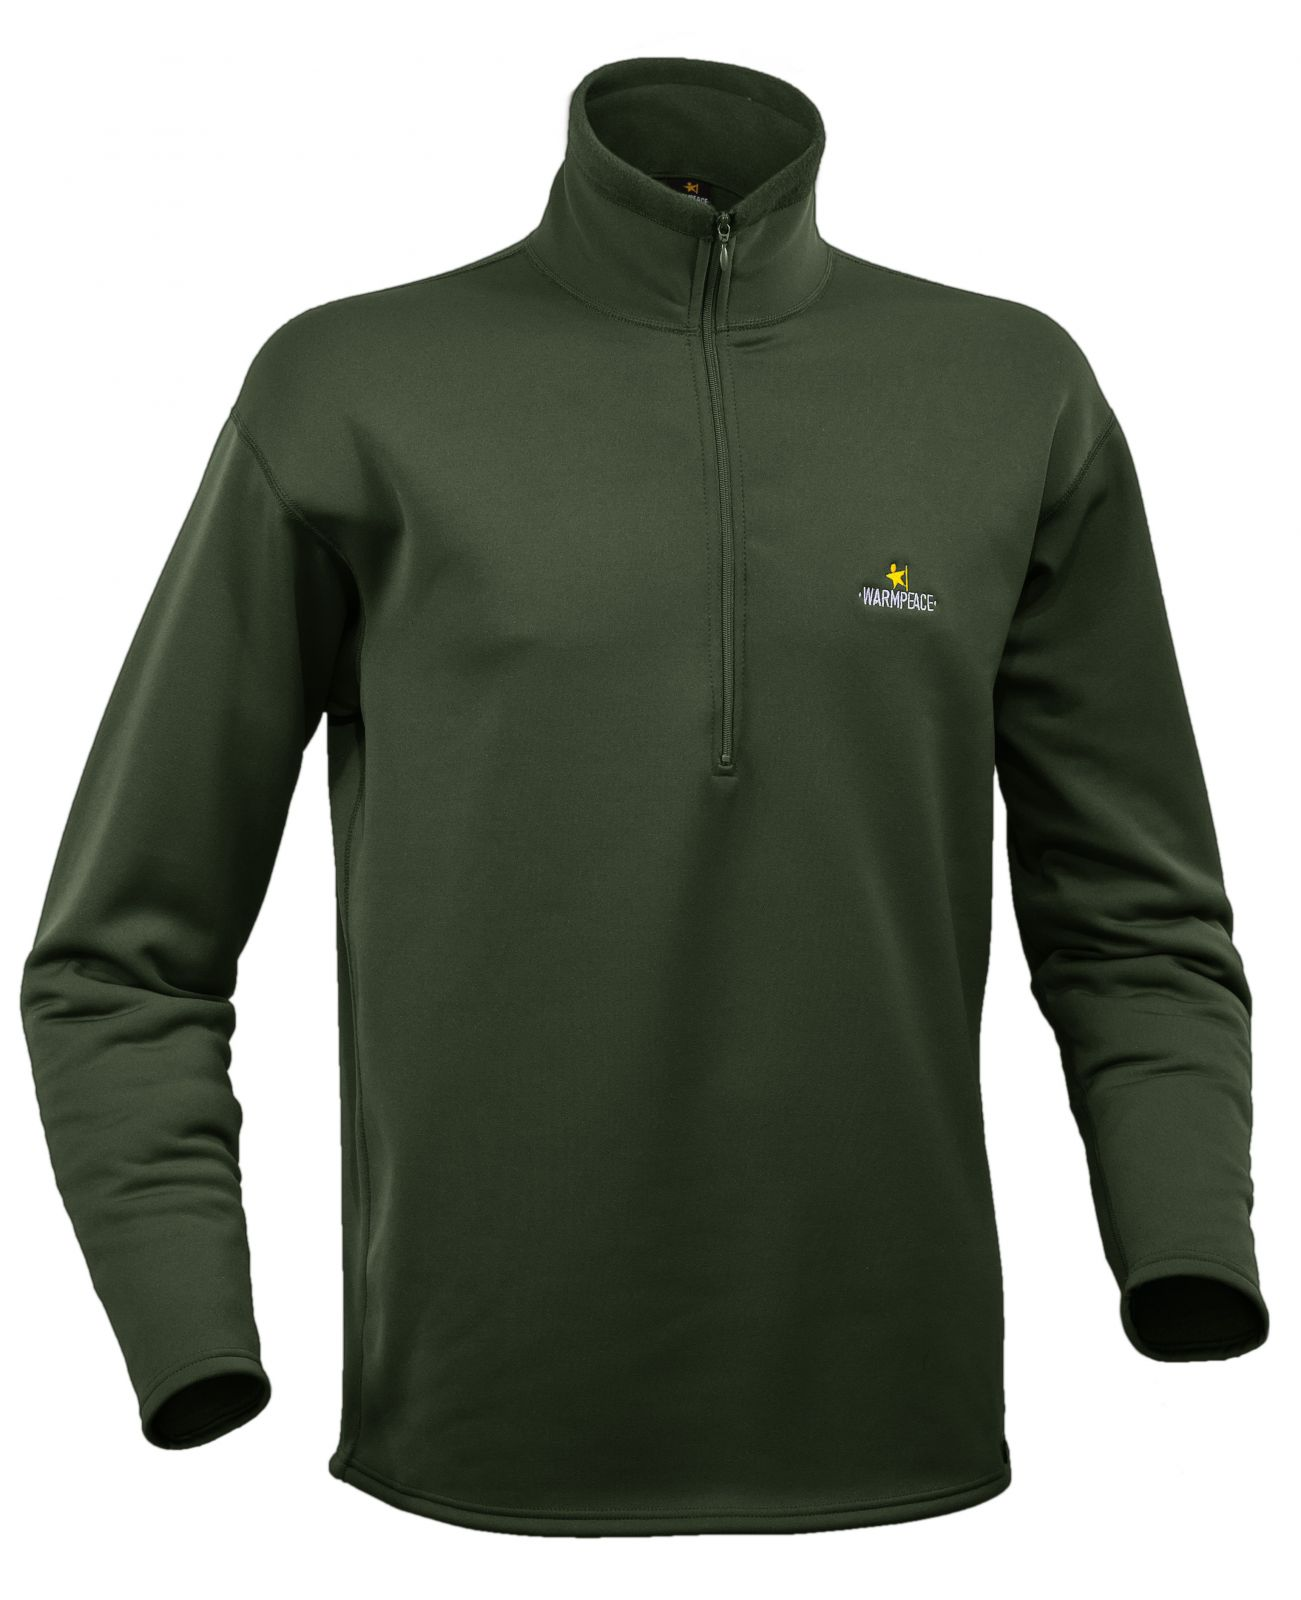 Tazz-Sport - Warmpeace Fram alpine green